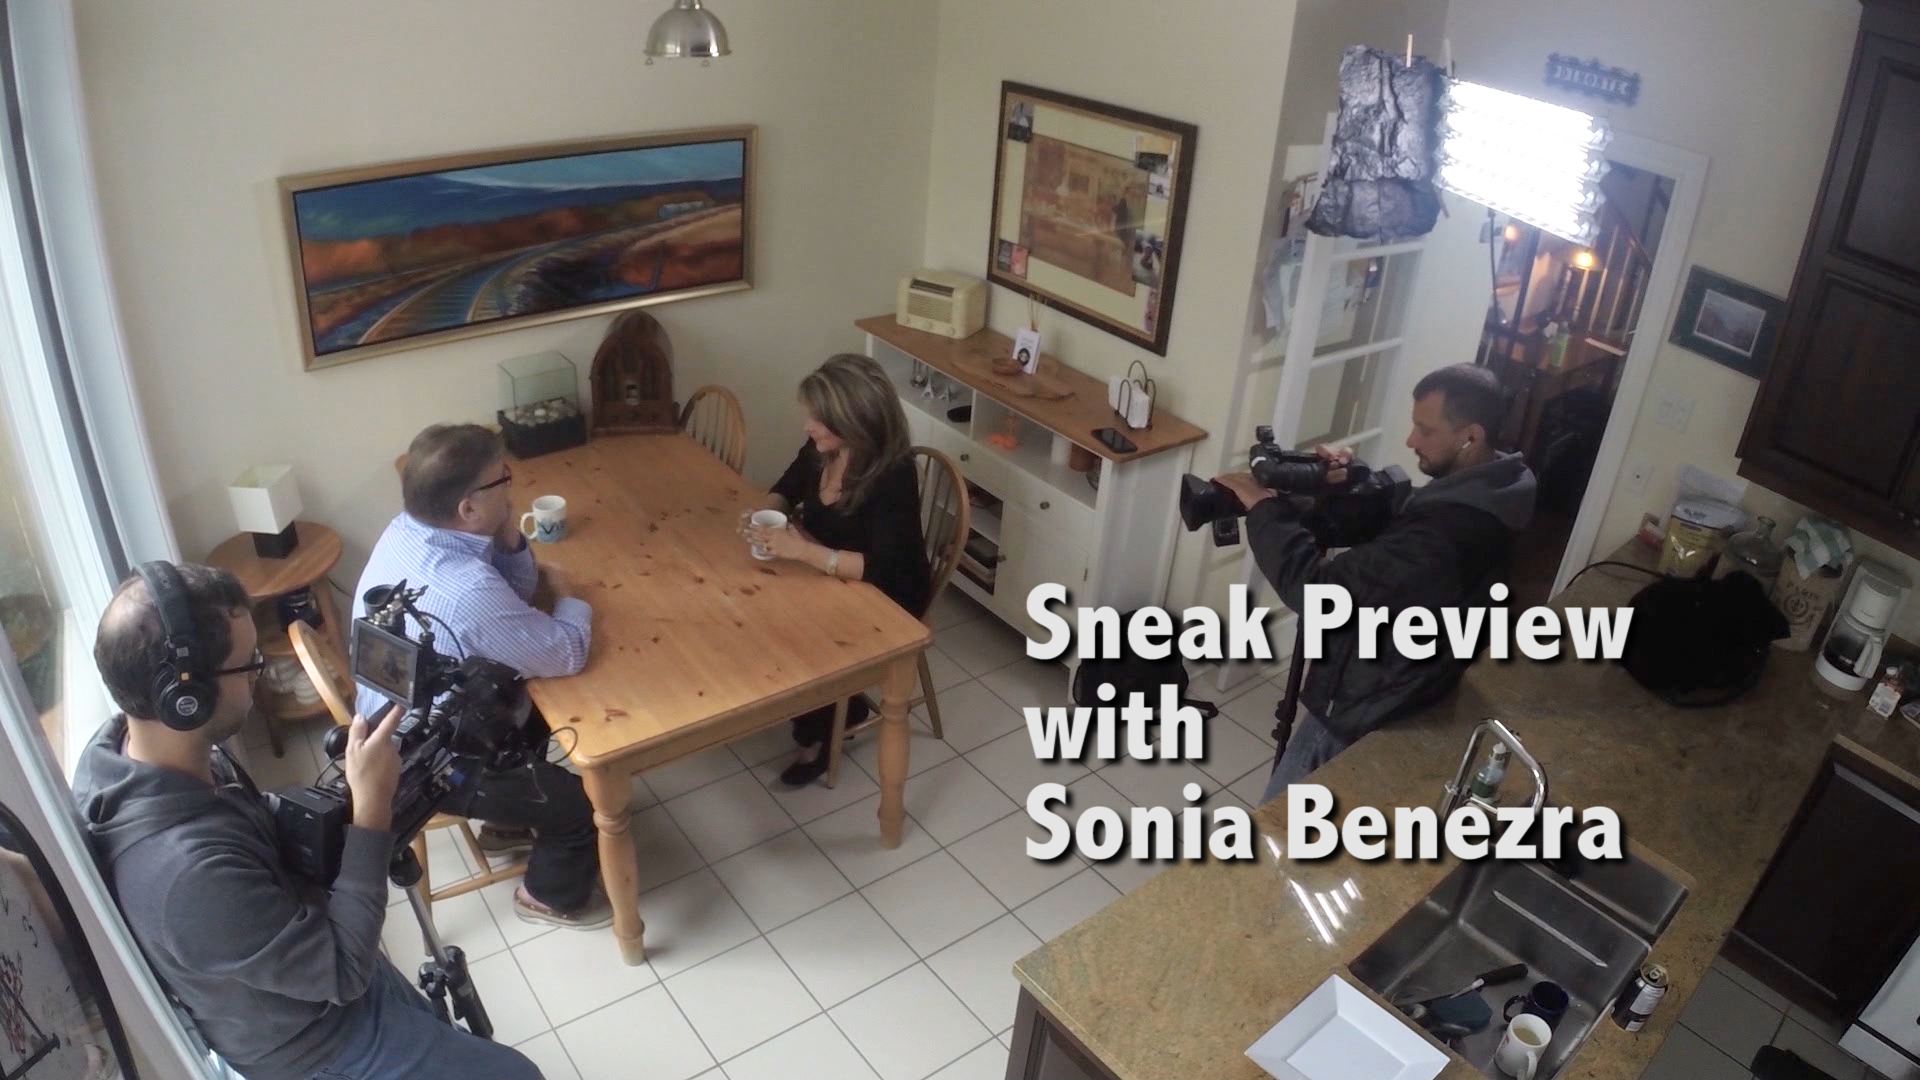 Sonia Benezra Preview 2